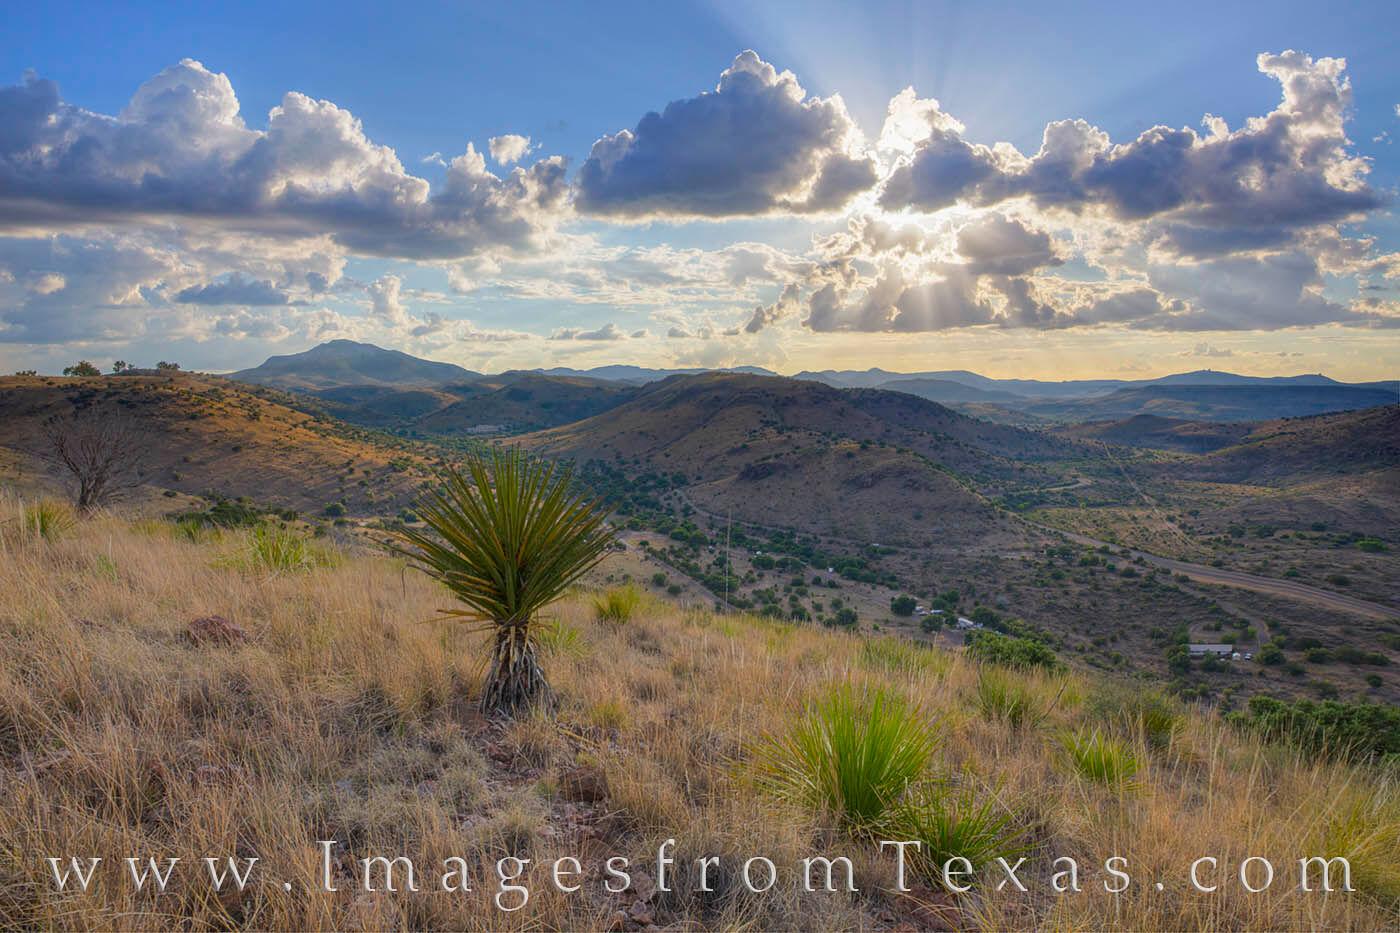 Davis Mountains photos, Davis Mountains overlook, Texas state parks, Davis Mountains state park, west texas, texas hikes, exploring texas, photo